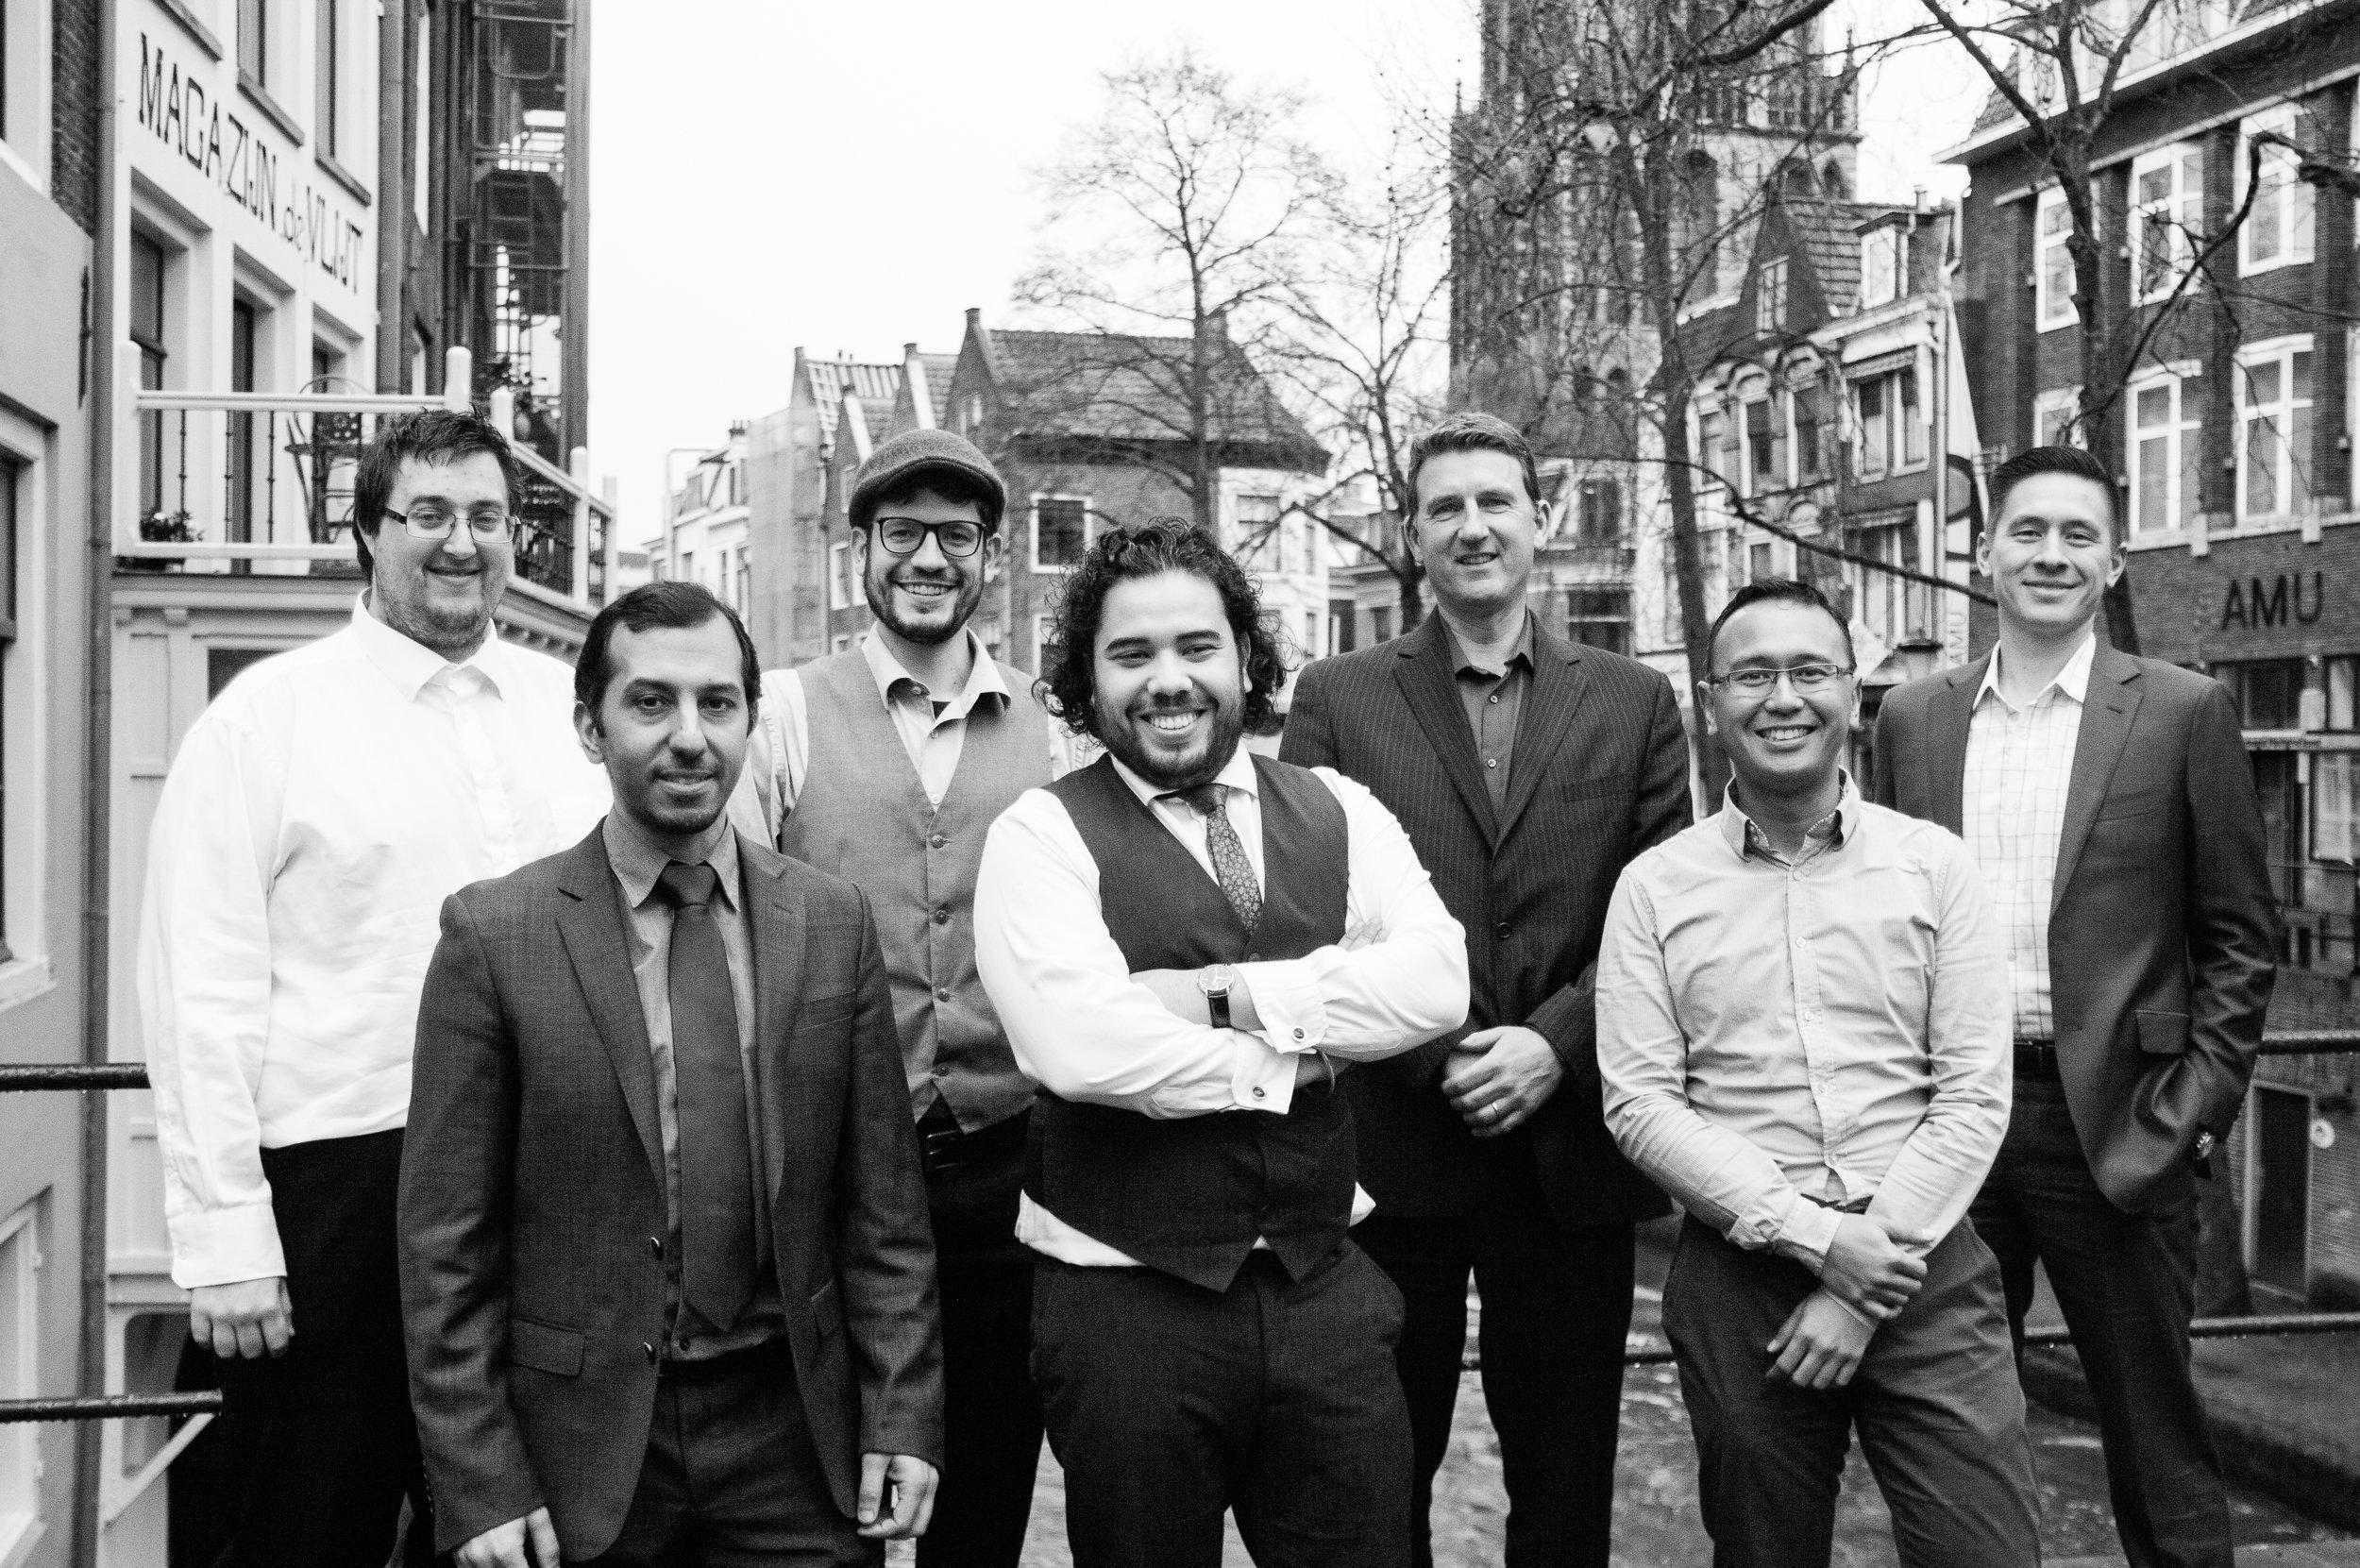 Contax Nederland B.V. Company Portrait. Utrecht, Netherlands.March, 2016.